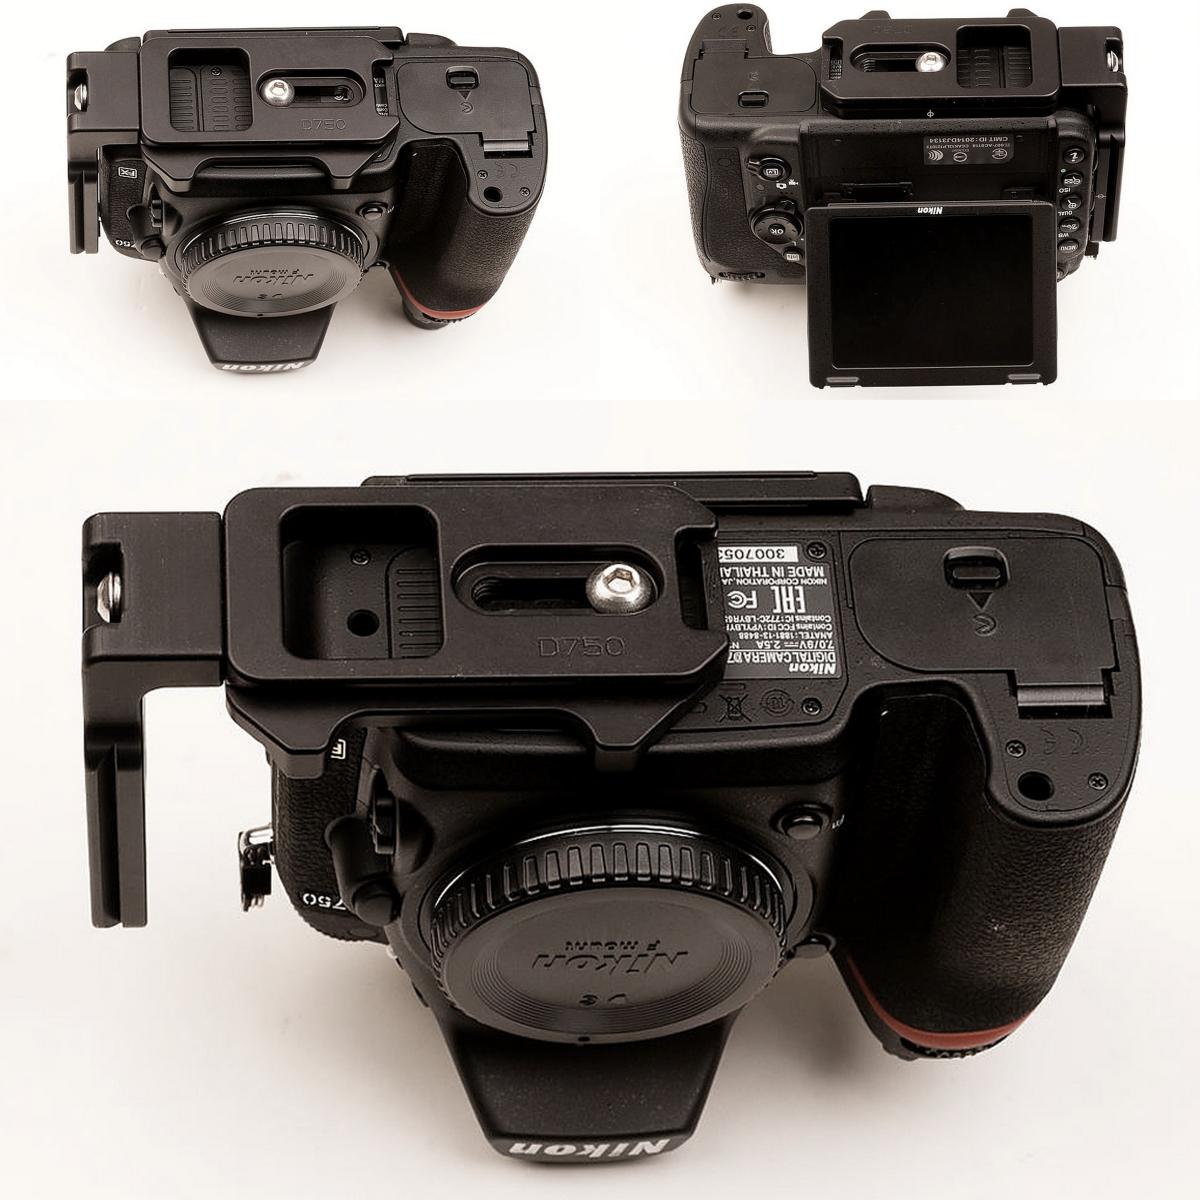 Hejnar PHOTO ND750 L bracket on Nikon D750 bottom views